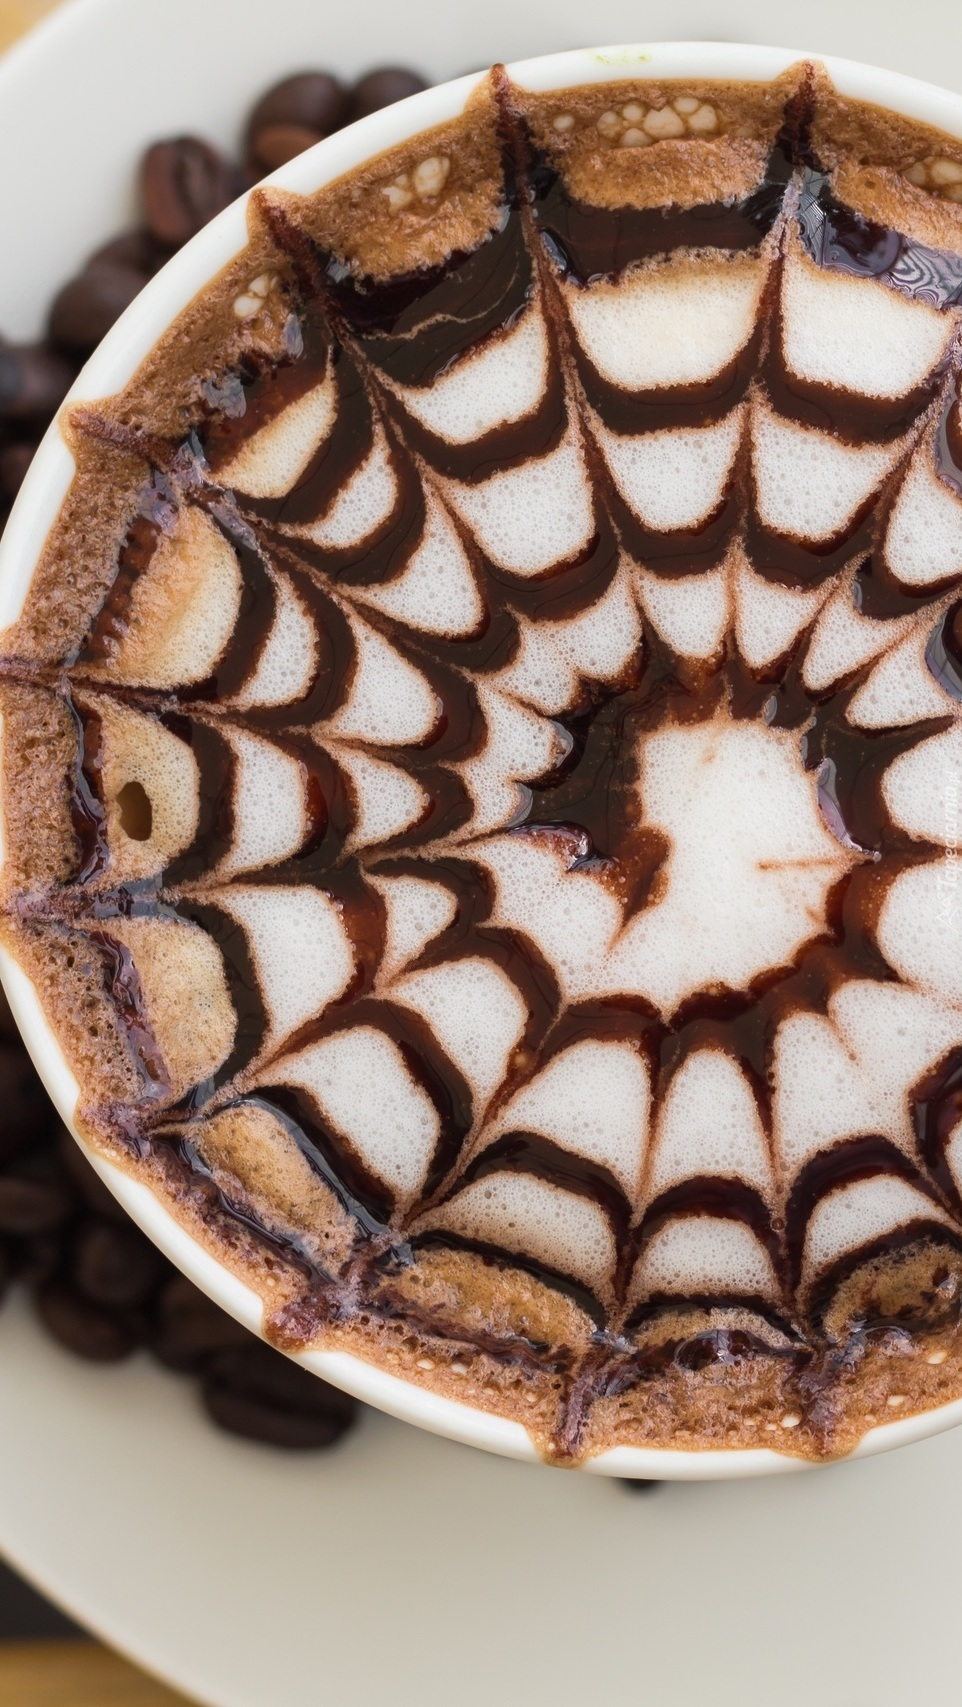 Wzorek na piance kawy